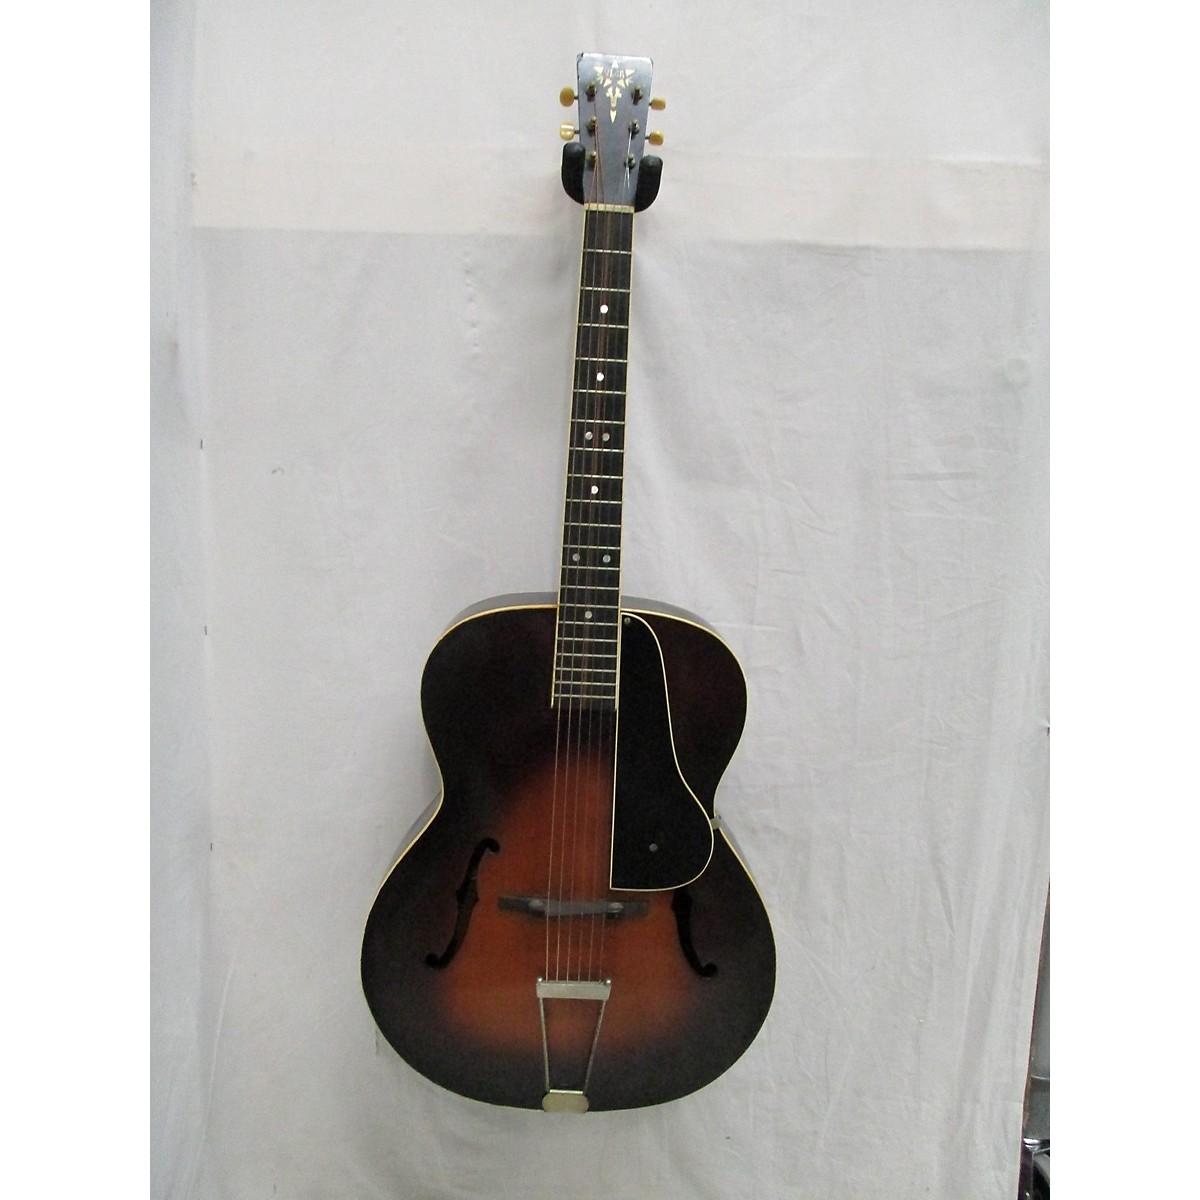 Vega 1930s C Series Archtop Acoustic Guitar